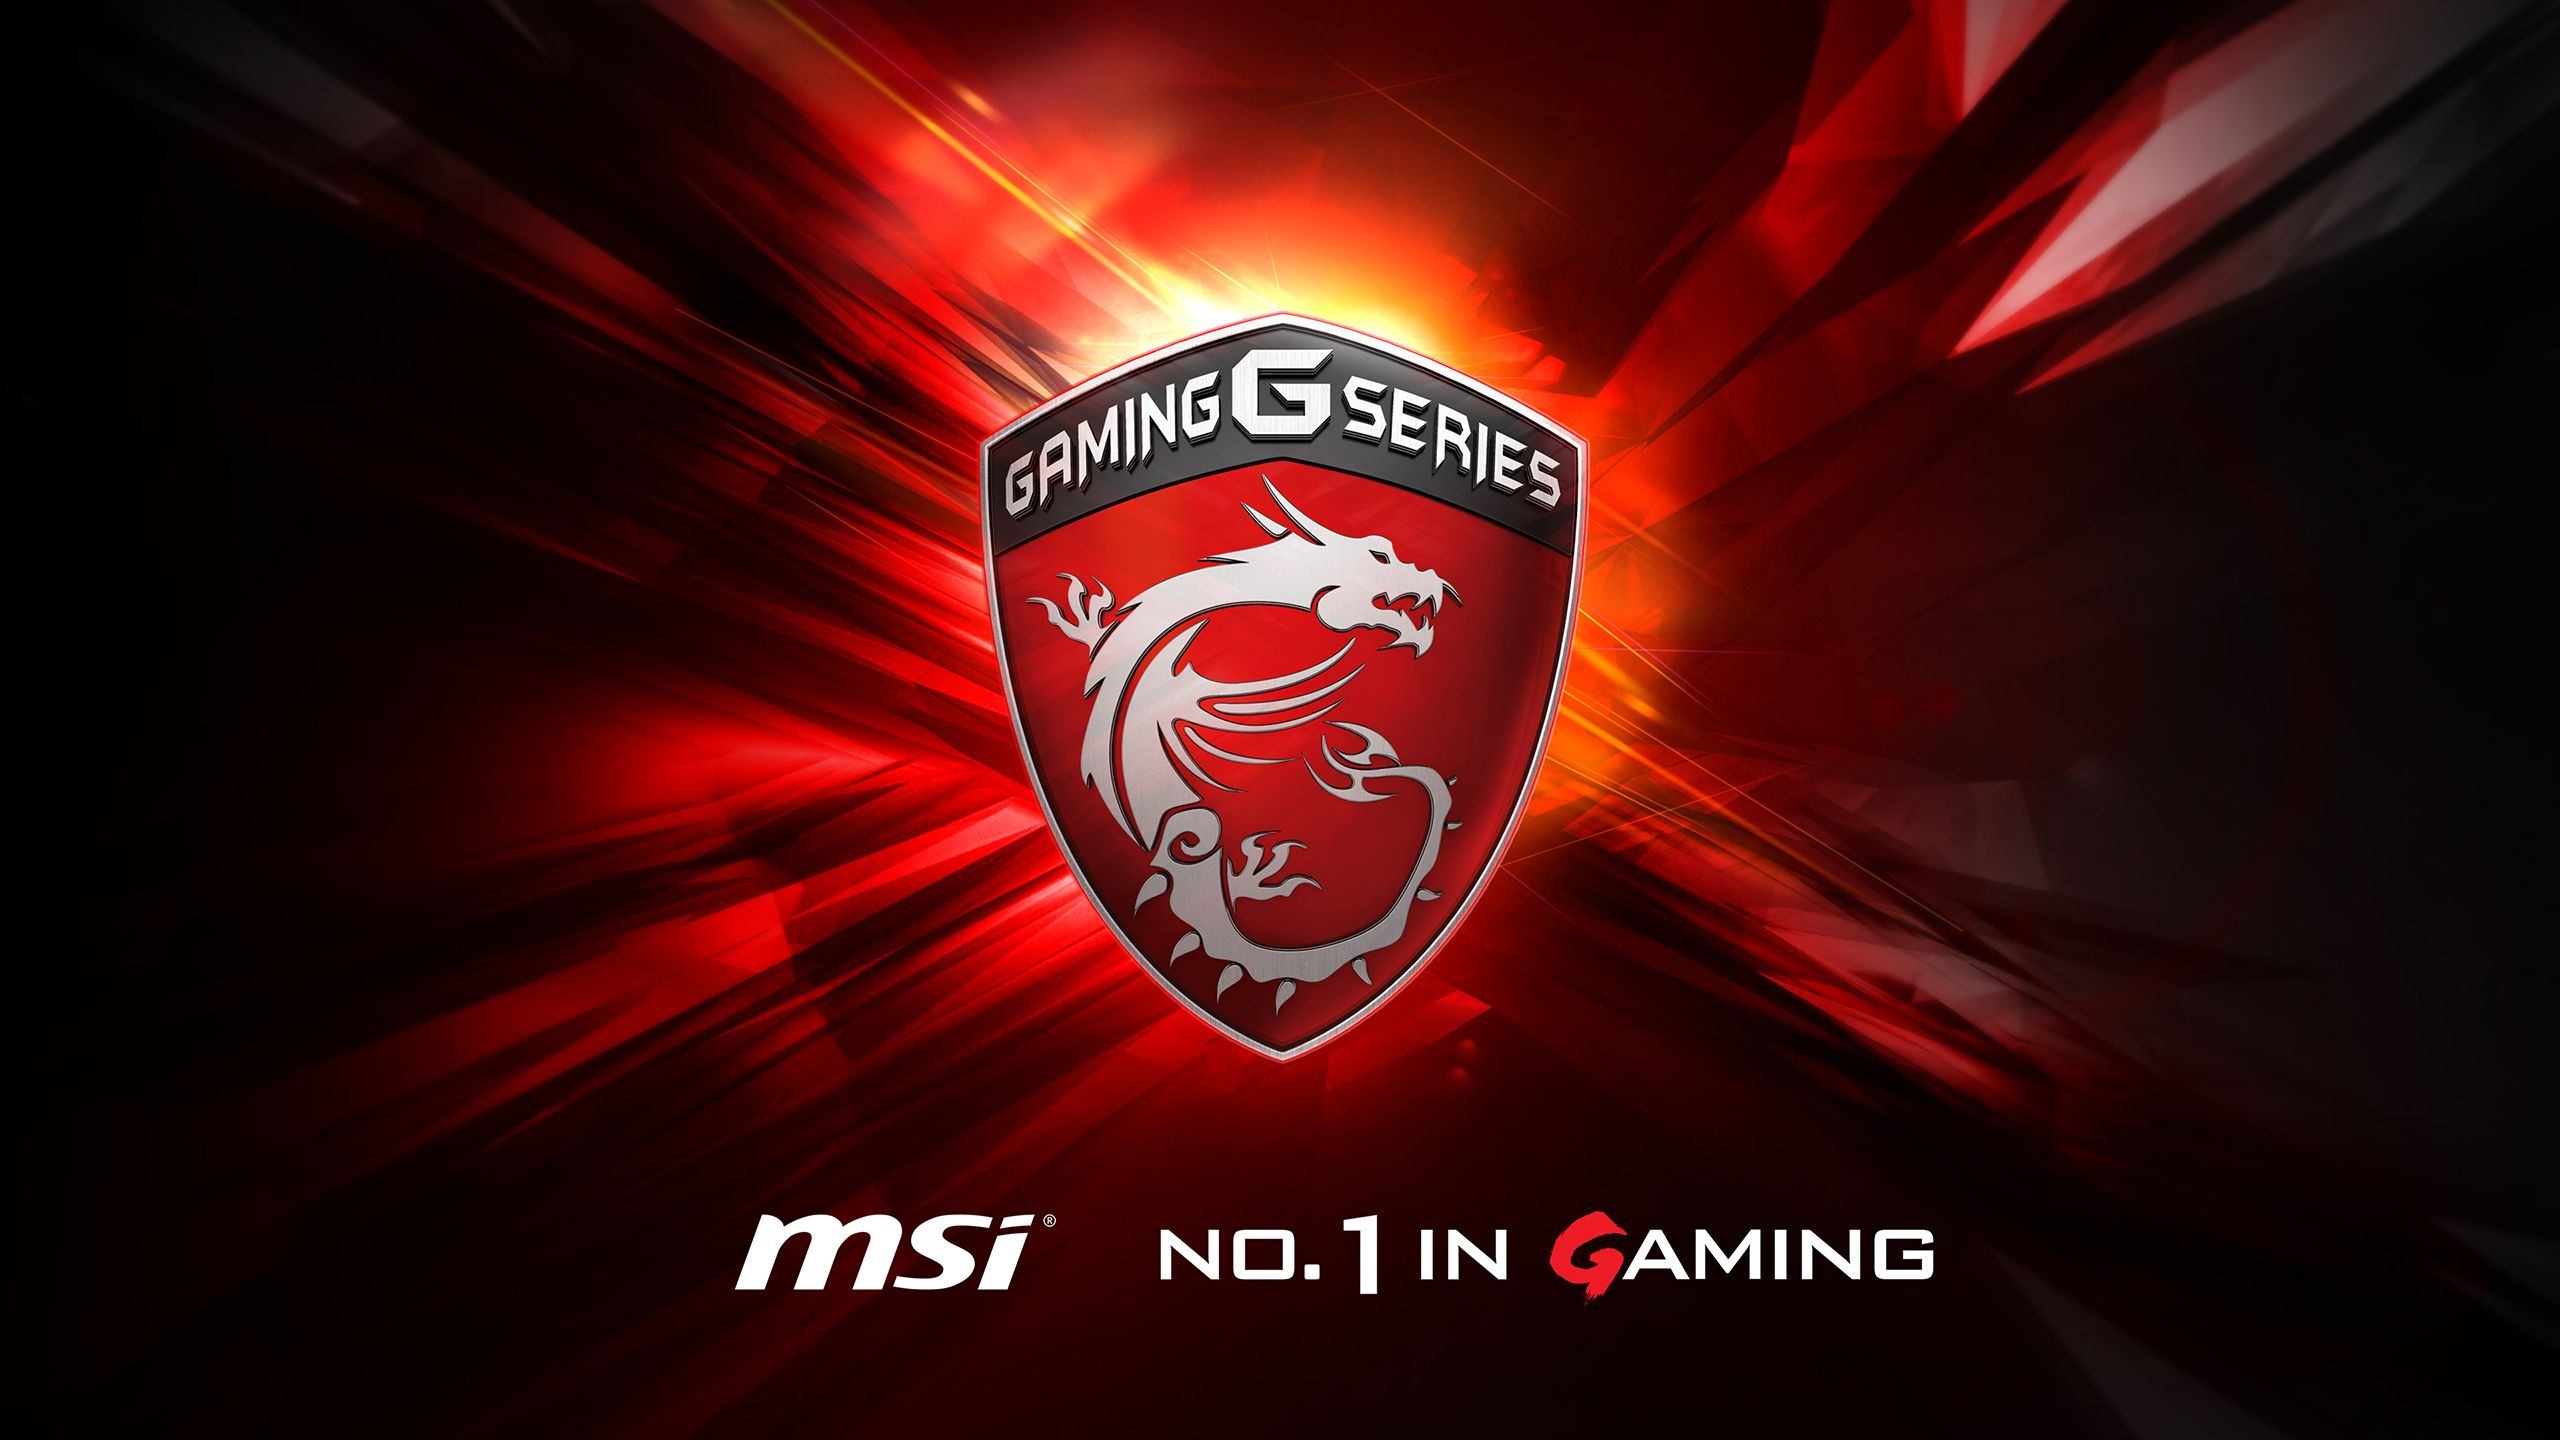 2560 X 1440 Gaming Wallpapers Top Free 2560 X 1440 Gaming